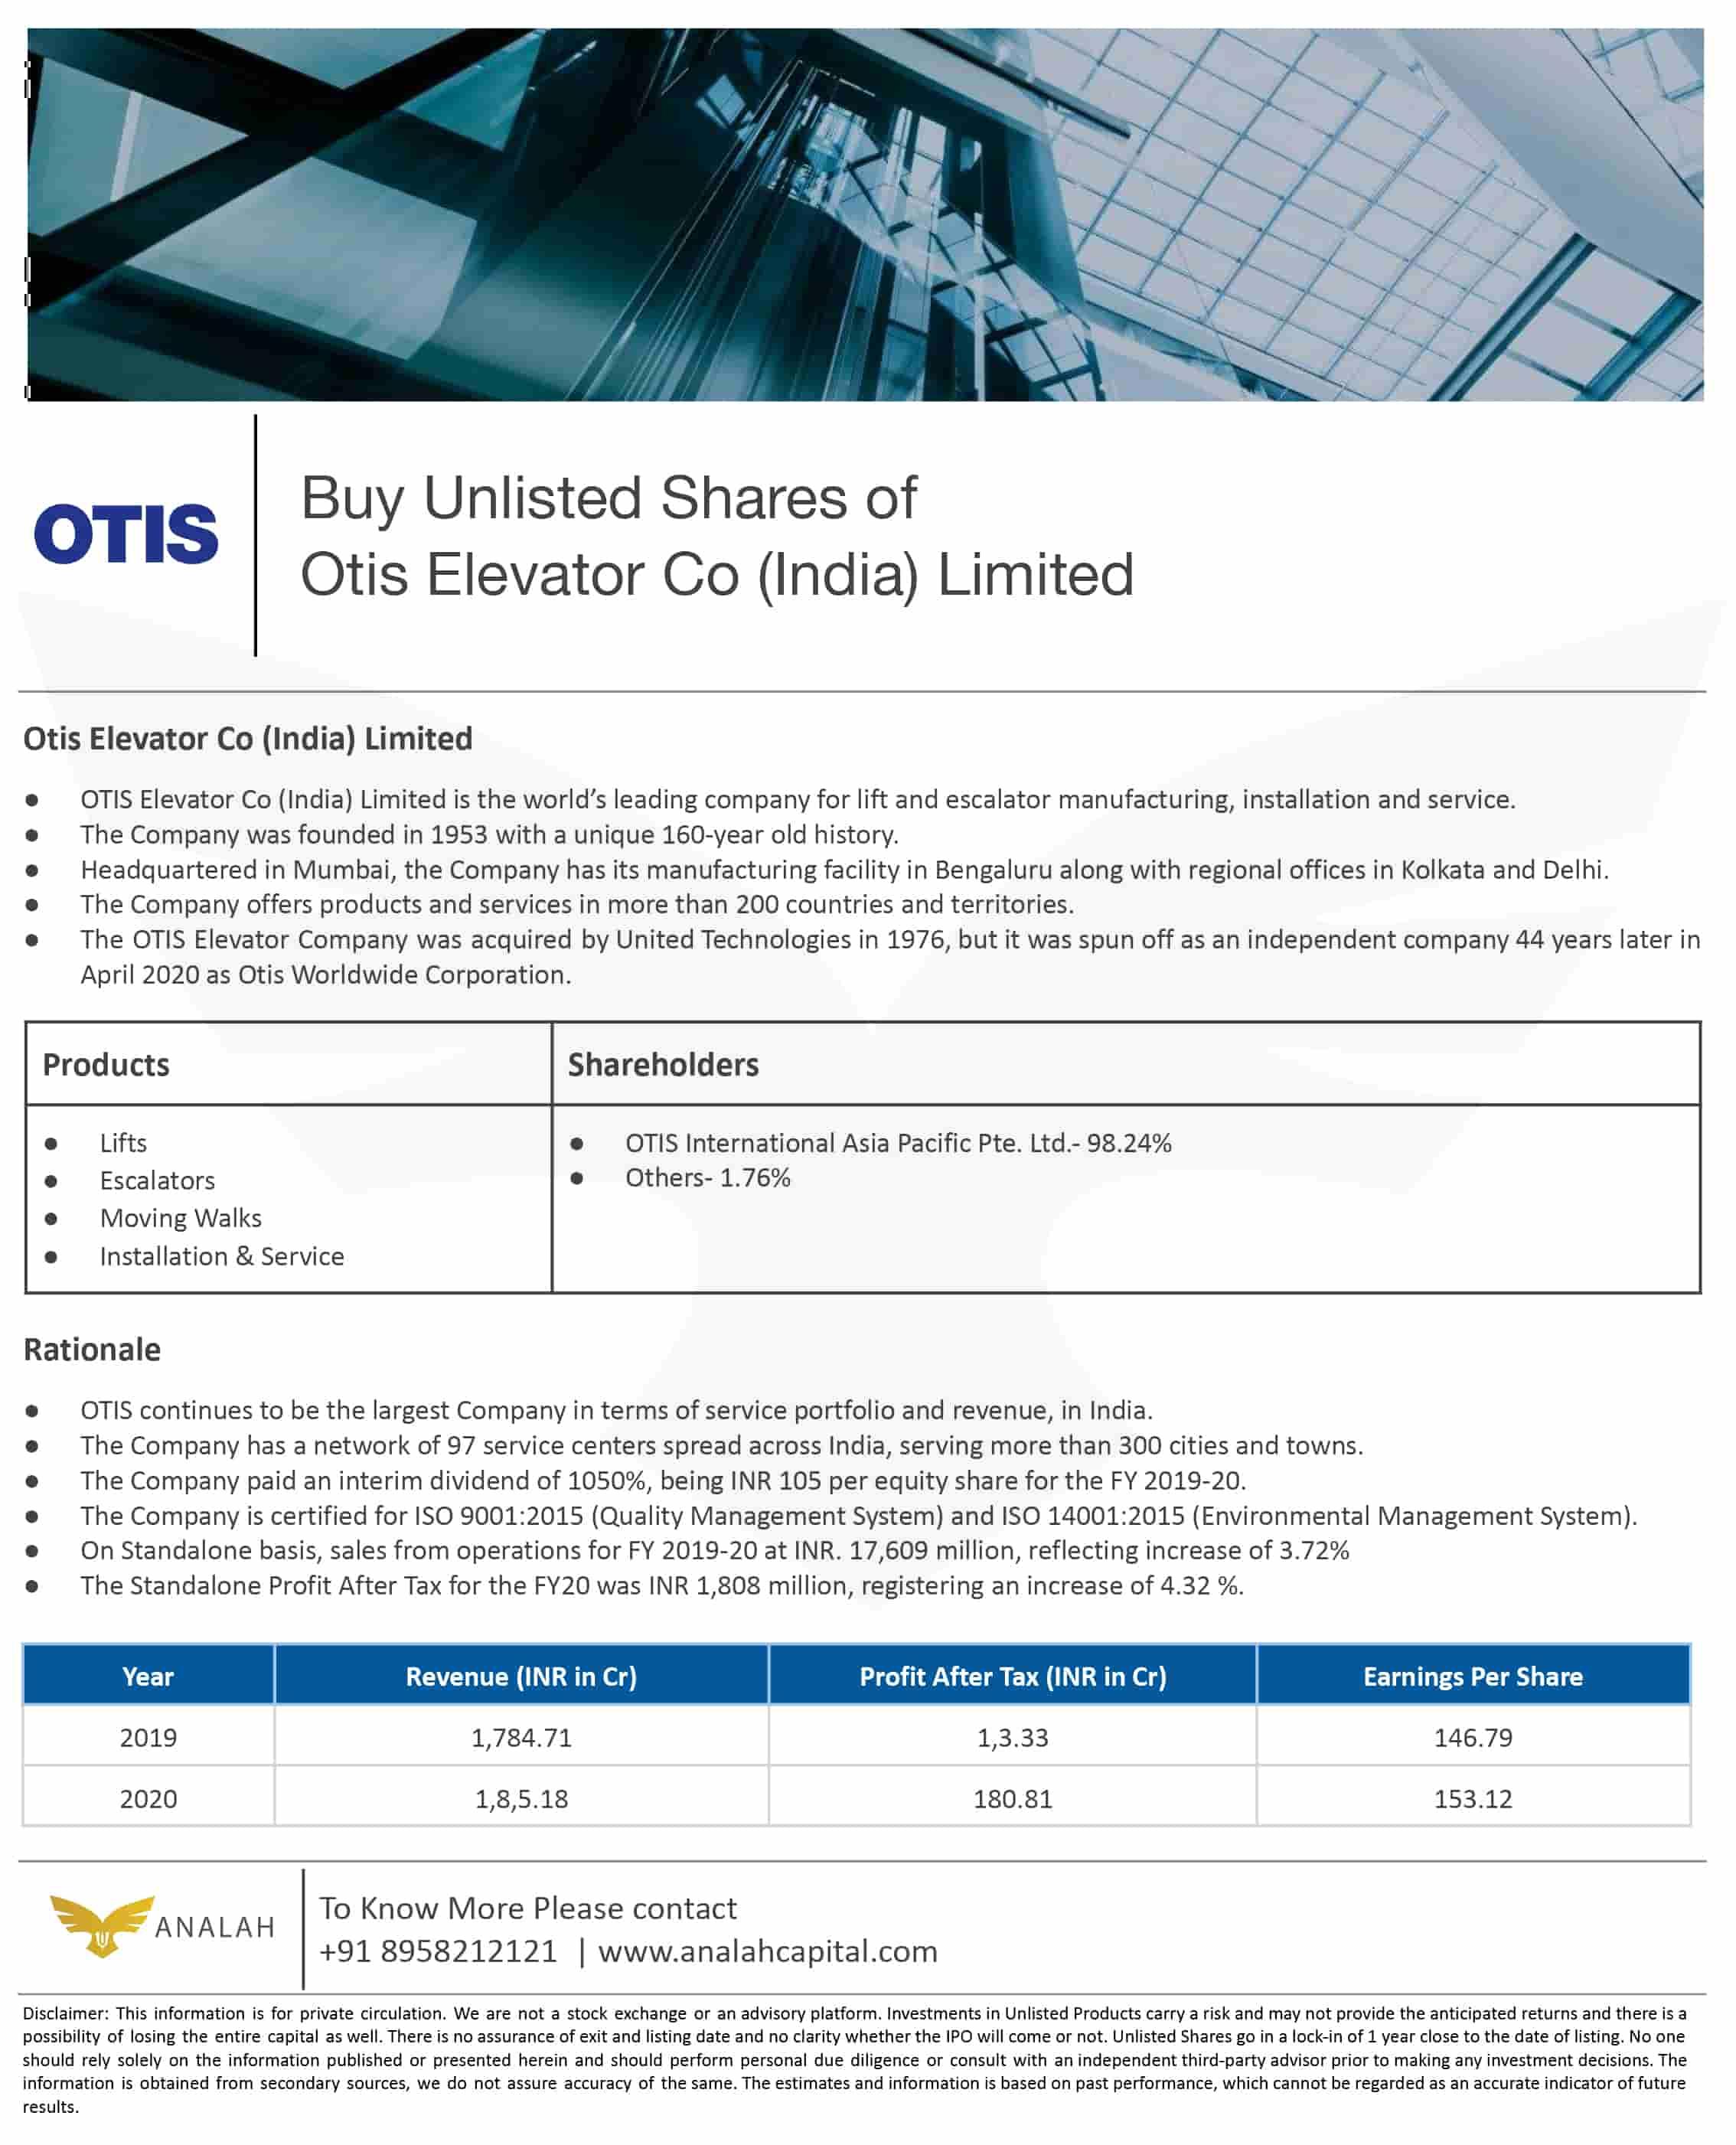 OTIS Elevators Unlisted Shares